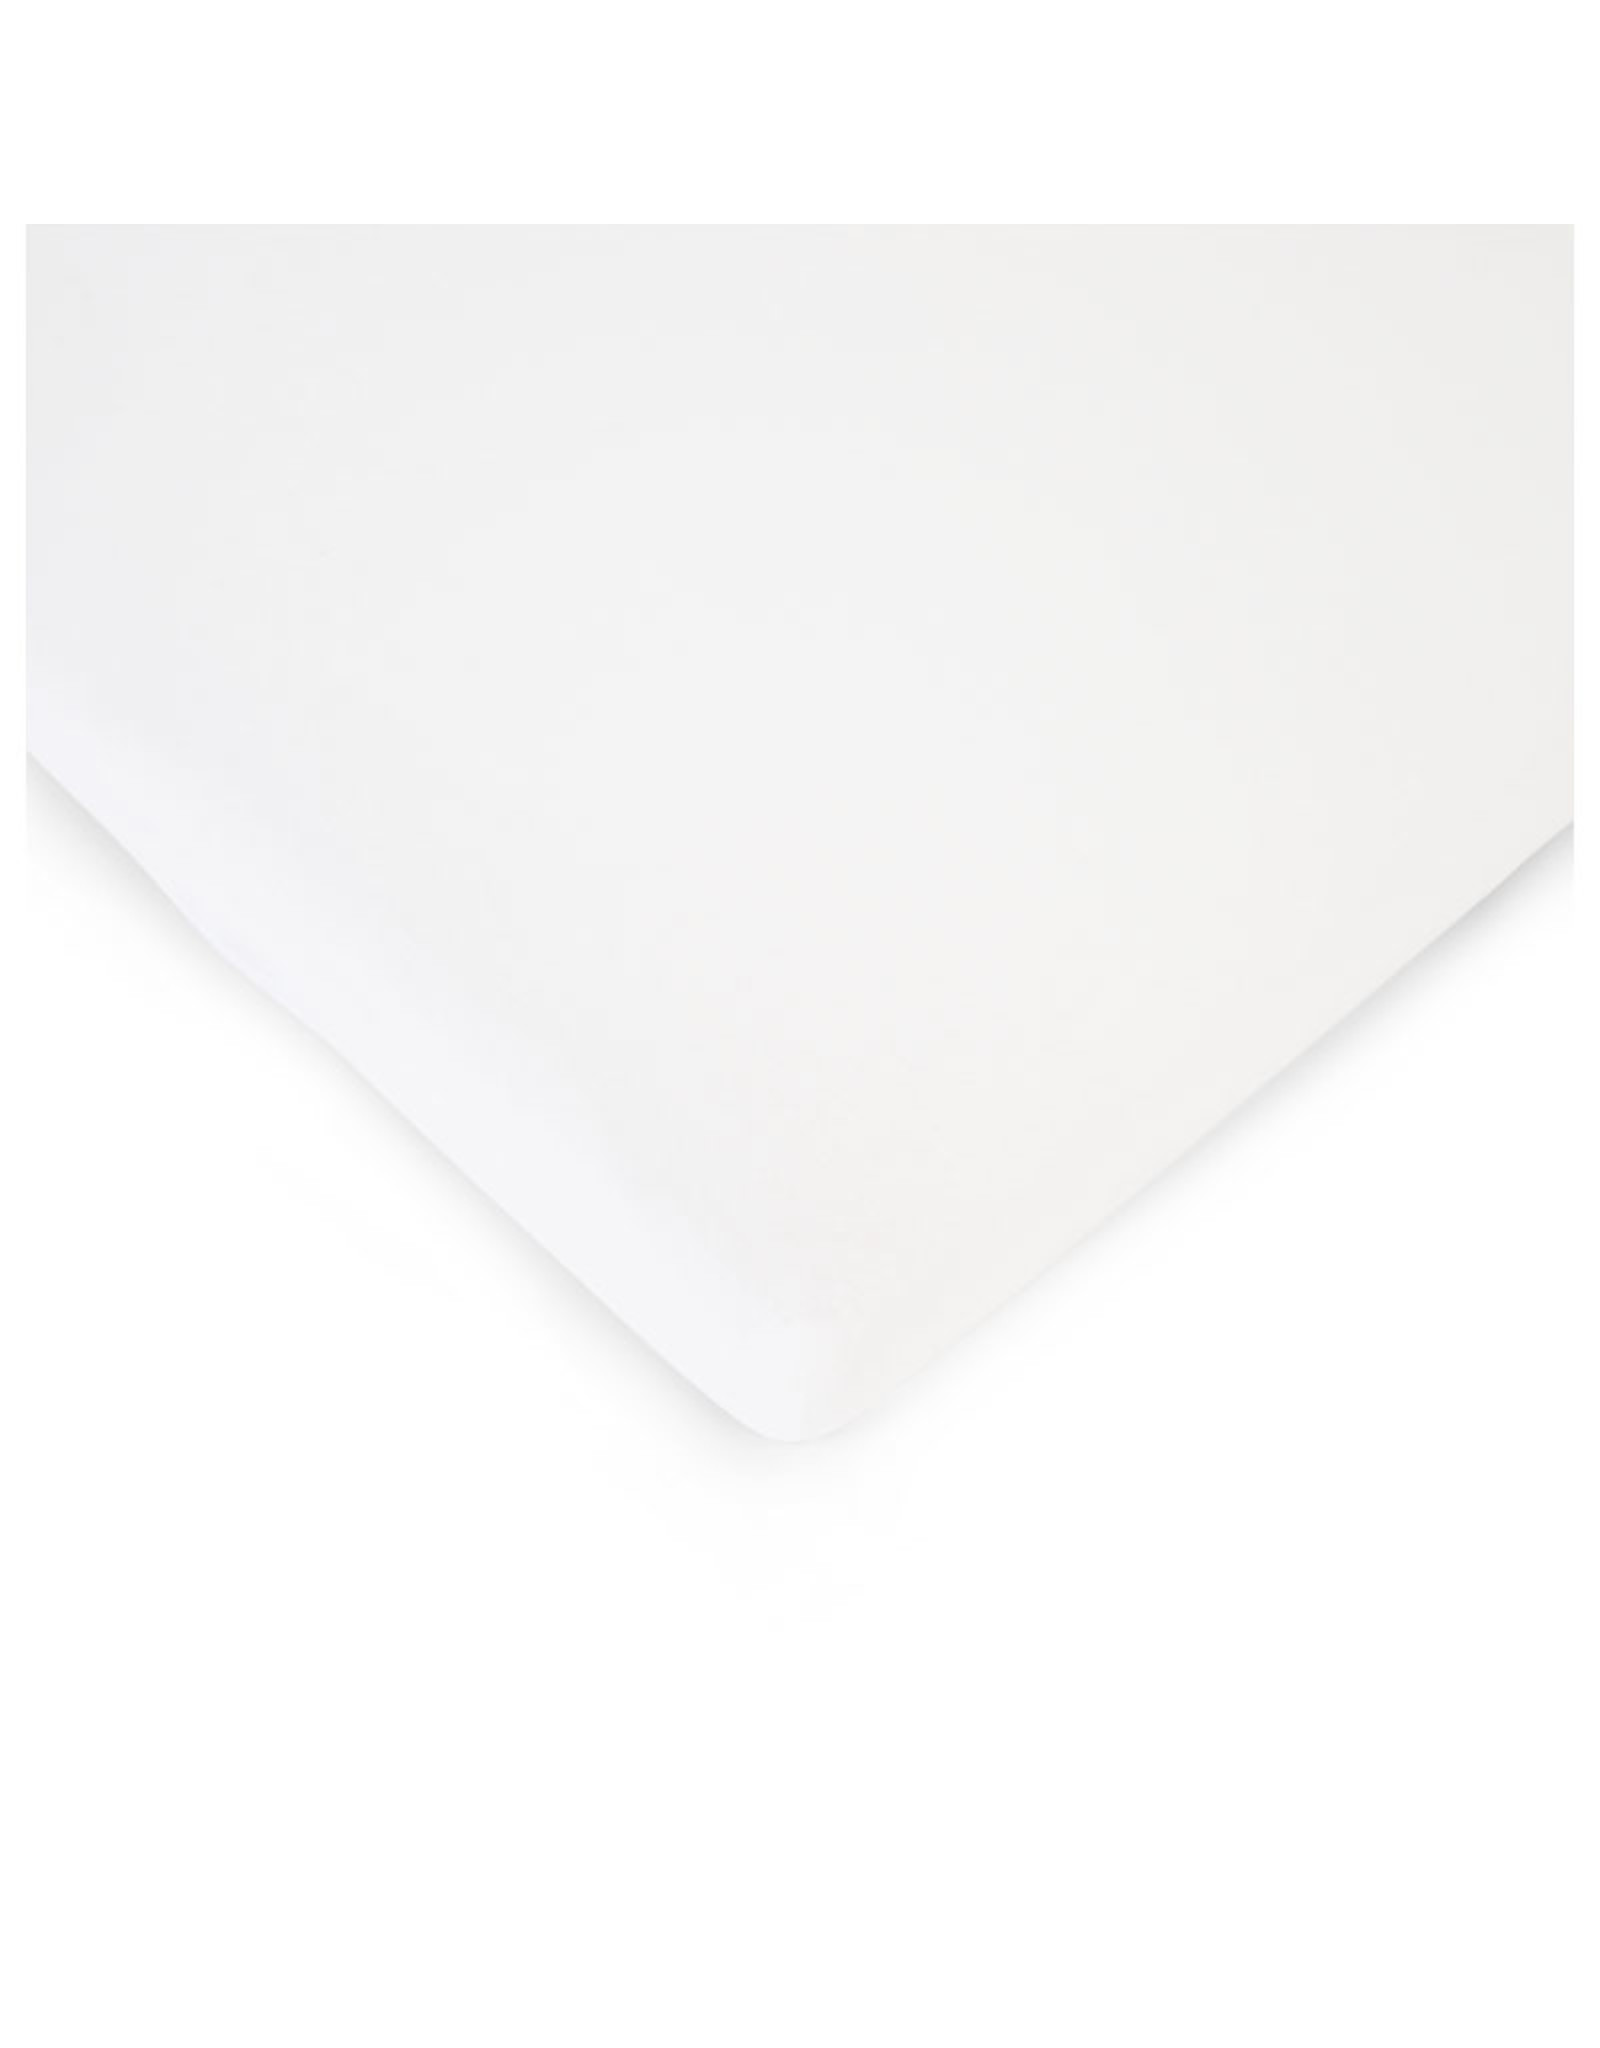 Childhome Childhome Hoeslaken Bedkant Wieg - 50x90 Cm - Biokatoen - Wit